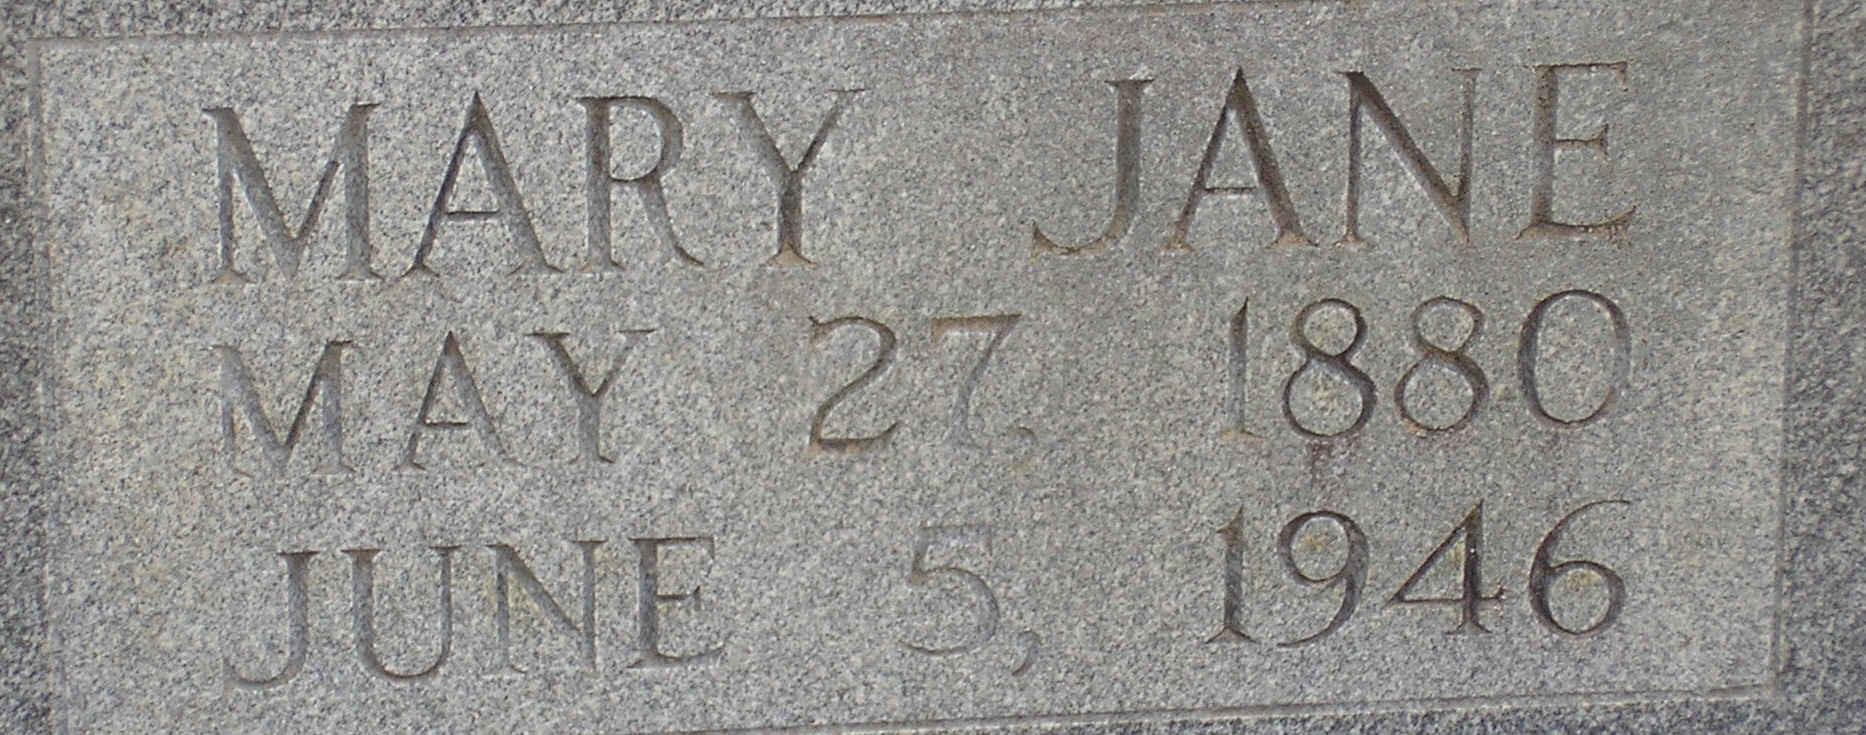 Mary Jane Caraway